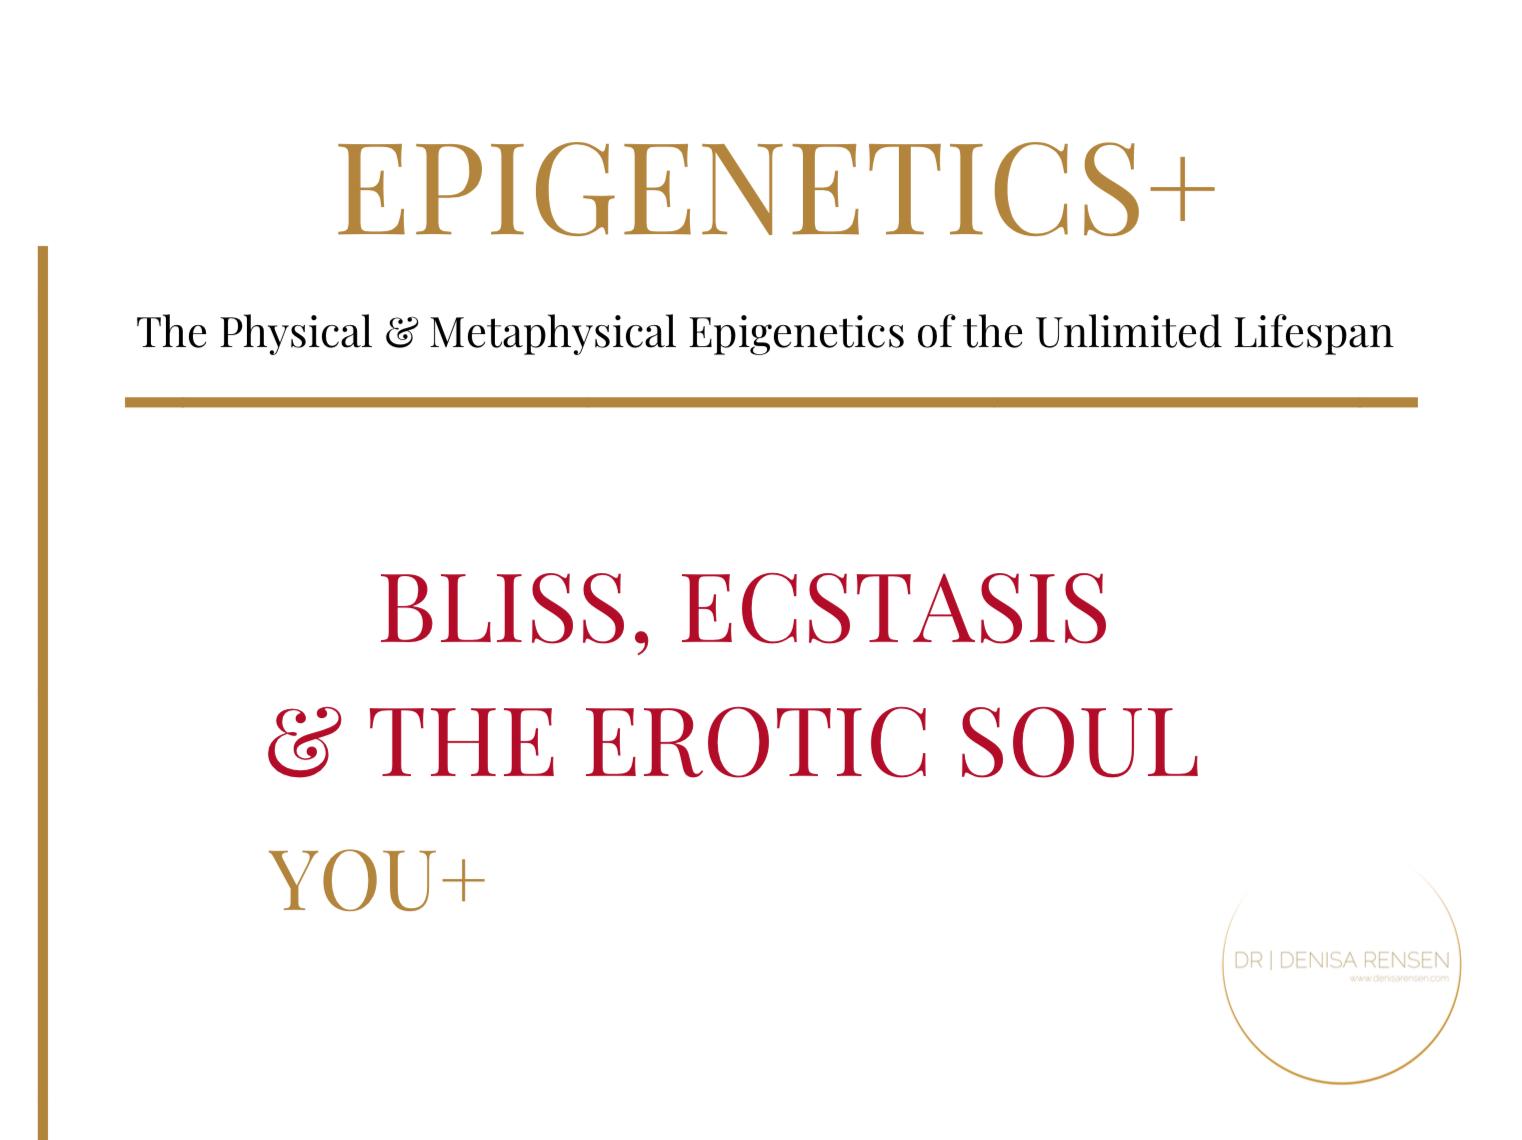 People Unlimited Epigenetics